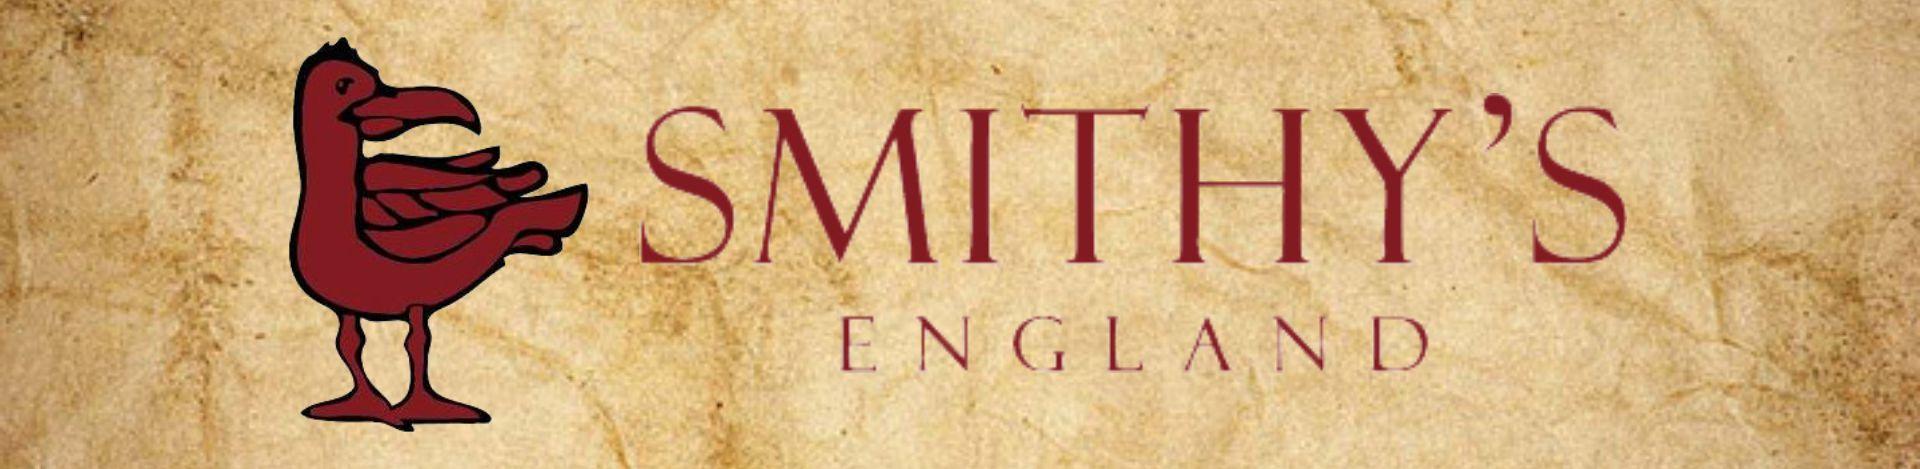 smithys-ban-1920